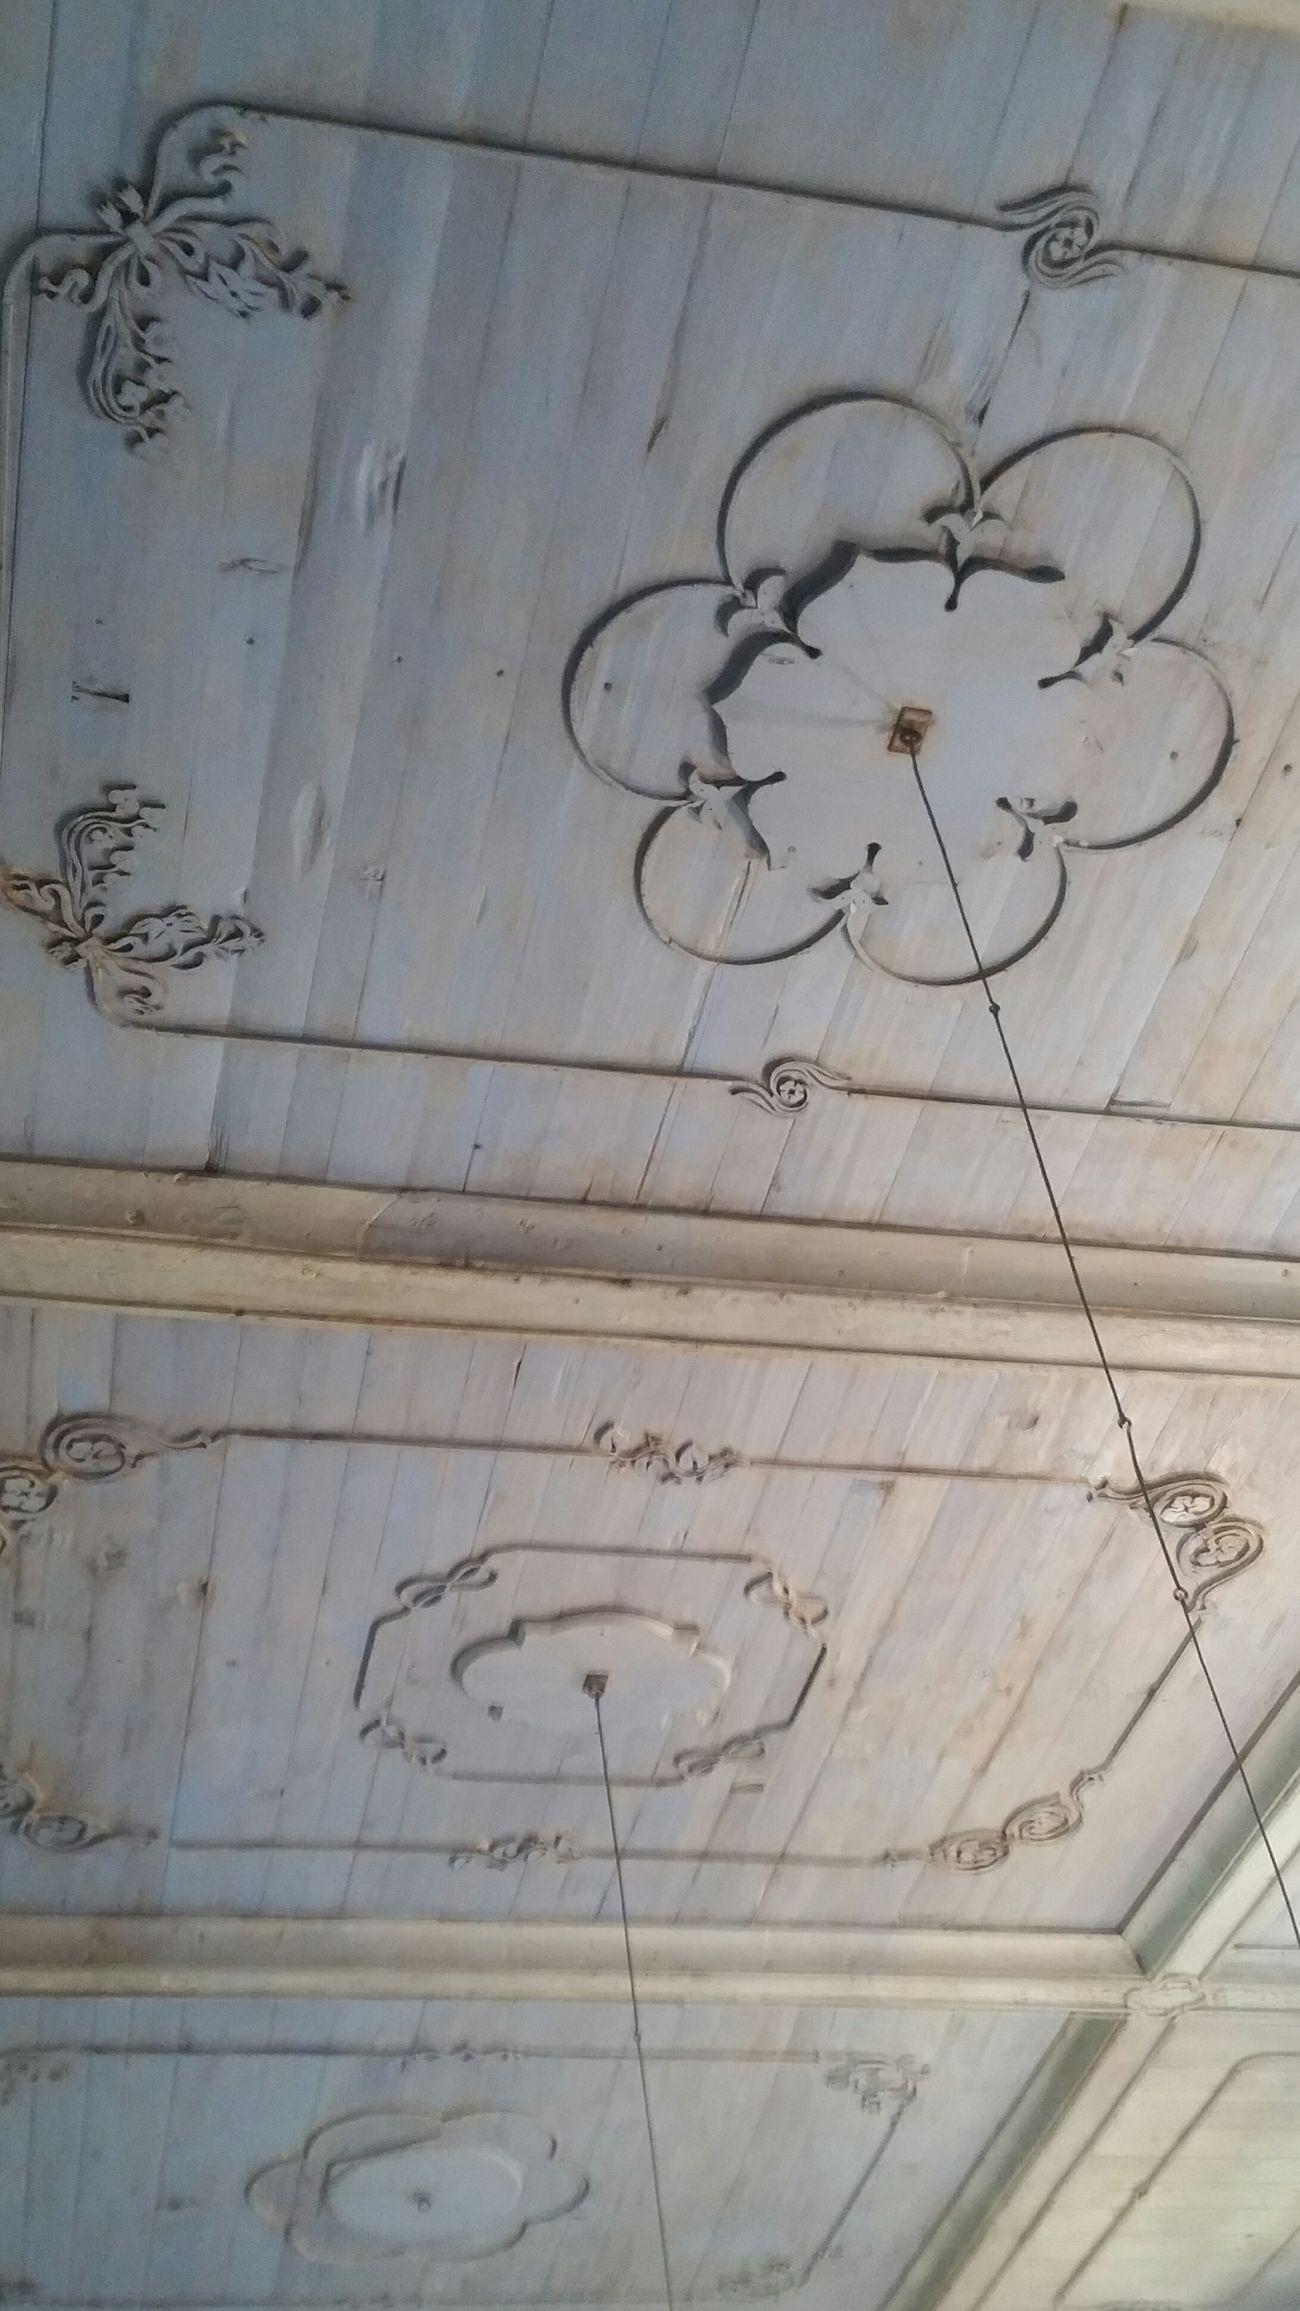 Building Exterior Built Structure Mission, Chapel, 1800's Ceiling Design Antiquity Religion The Secret Spaces Relaxation